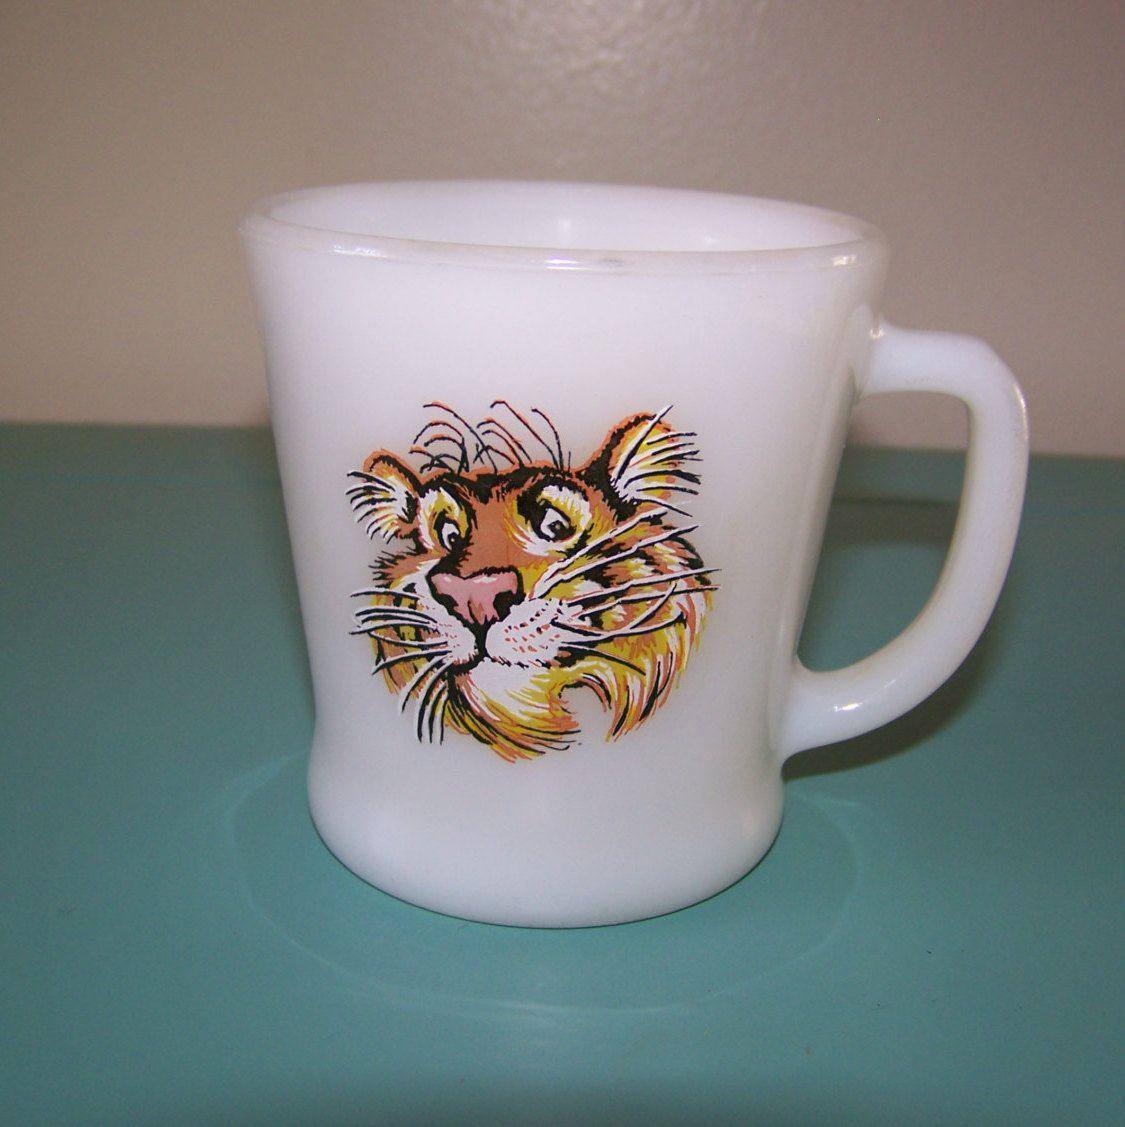 8ebb7b9f80a Esso the Tiger Mug Mid Century Vintage Exxon Anchor Hocking Fire King Milk Glass  Mug Put a Tiger in Your Tank (6.25 USD) by AKitschIsJustAKitsch